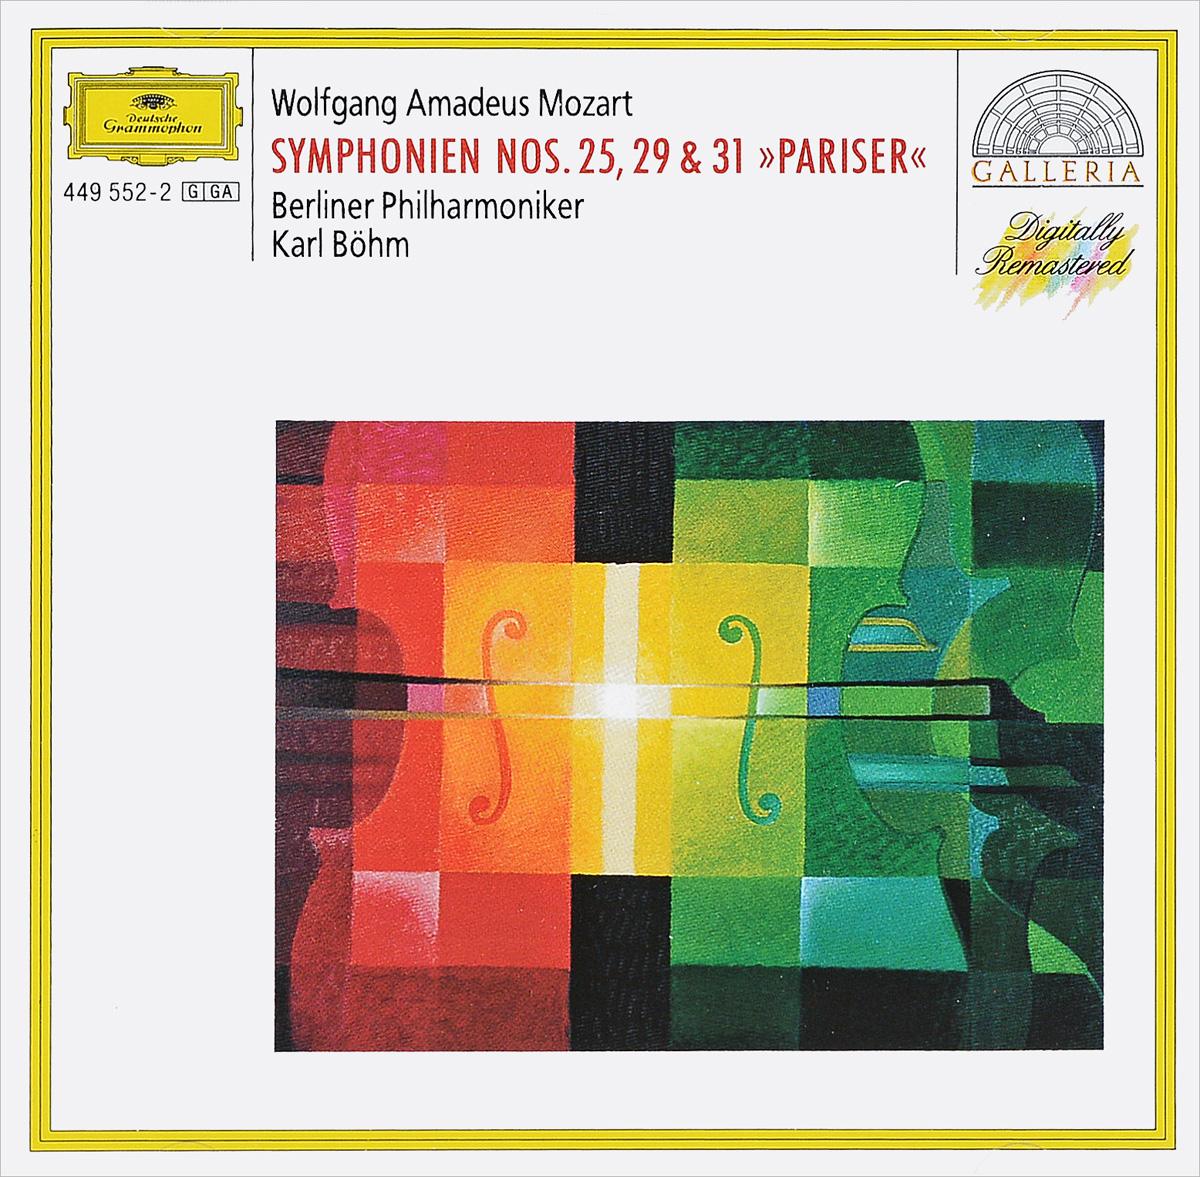 Карл Боэм Karl Boehm. Mozart: Symphonies Nos.25, 29 & 31 карл боэм karl boehm mozart the abduction from the serail 2 cd